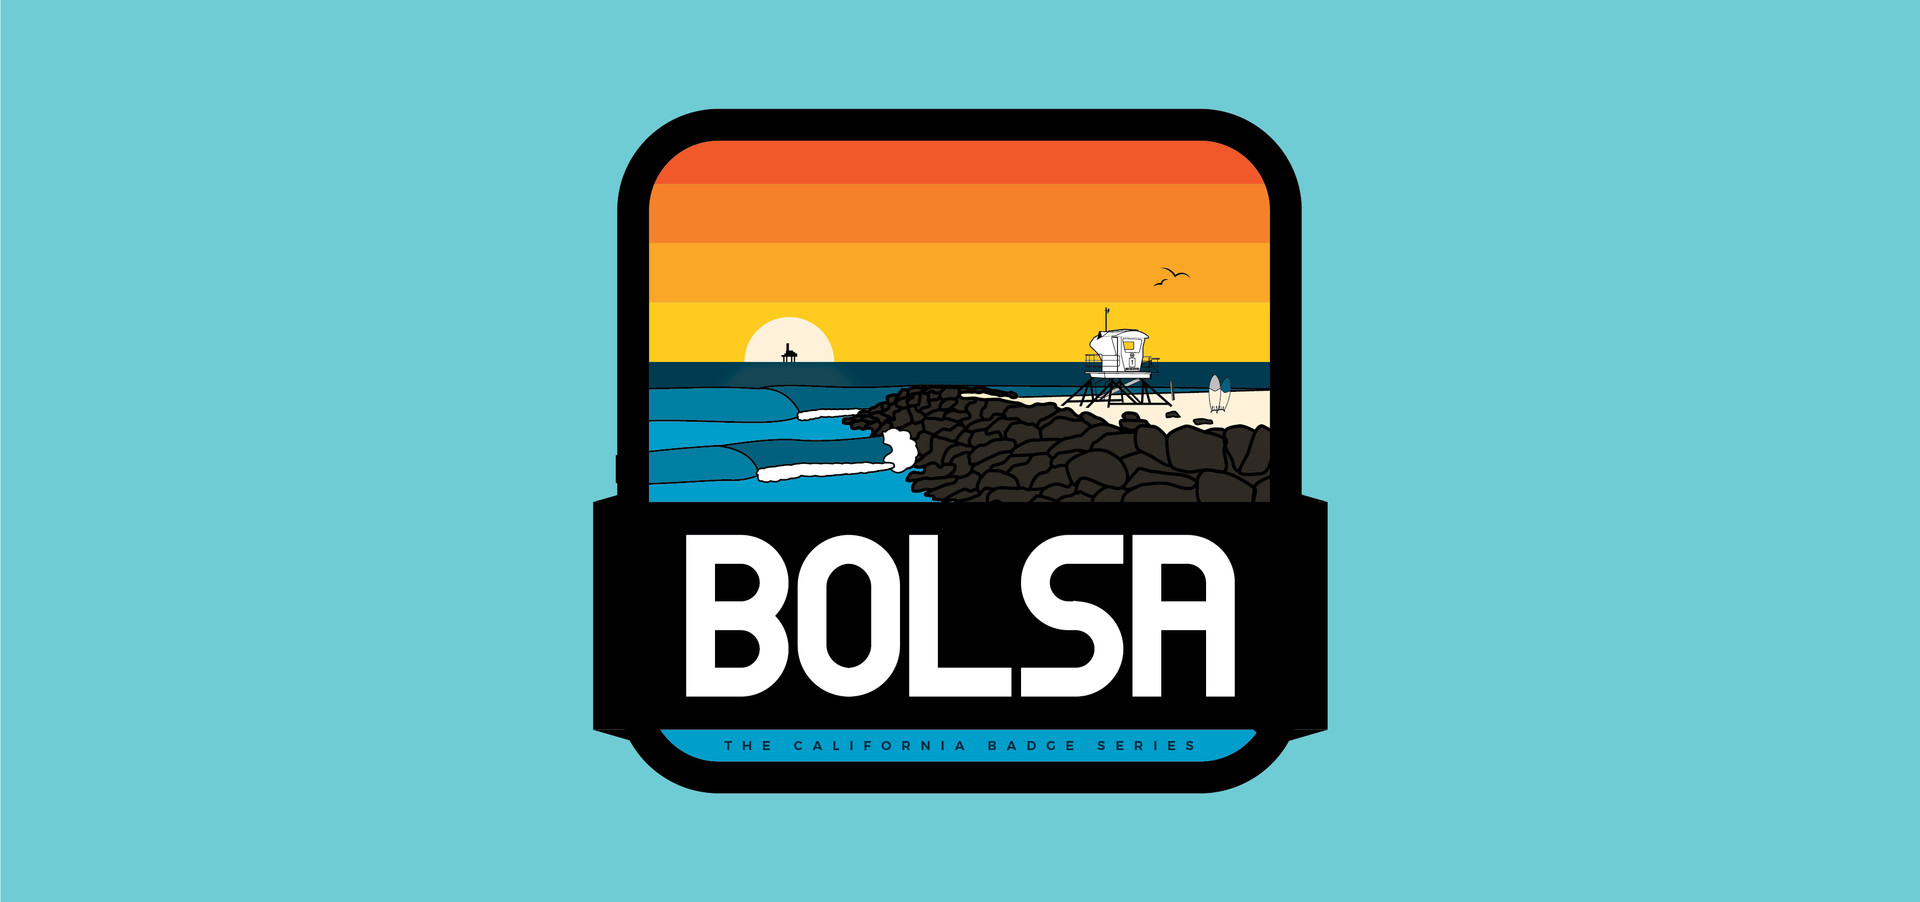 BOLSA-15.jpg